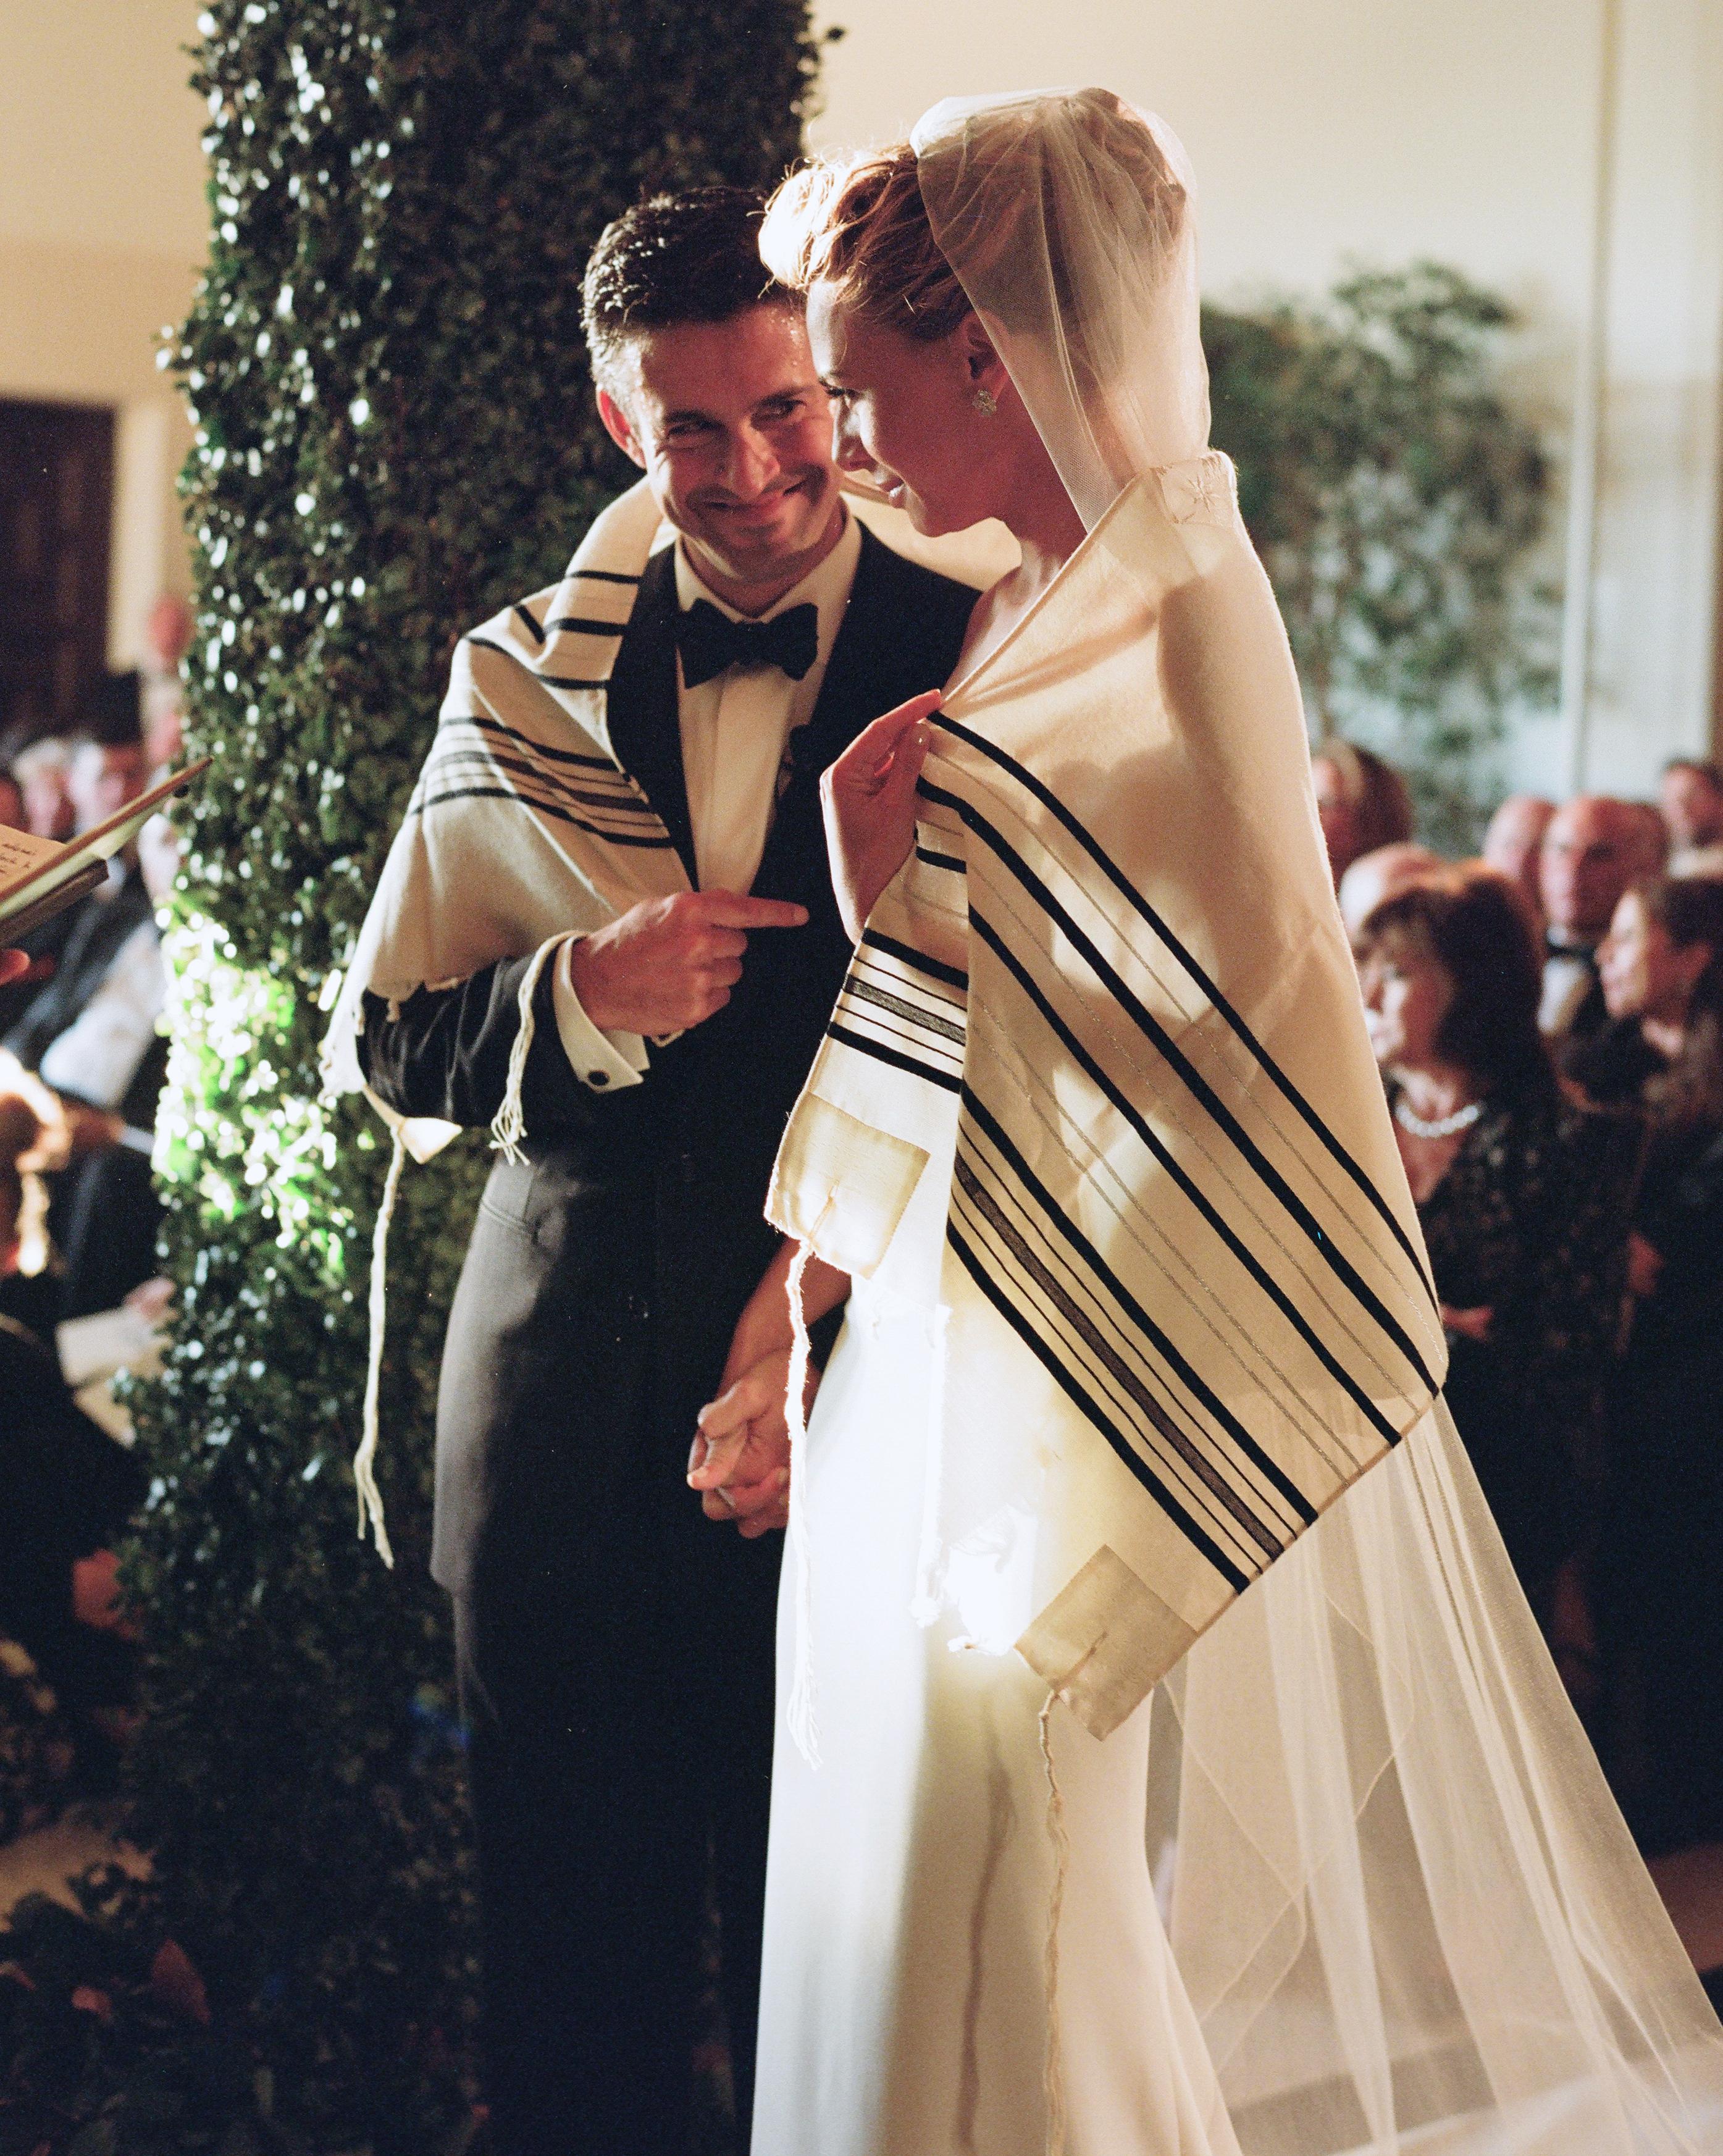 real-wedding-fall14-jojo-eric-361elizabeth-messina-ds111226-0814.jpg